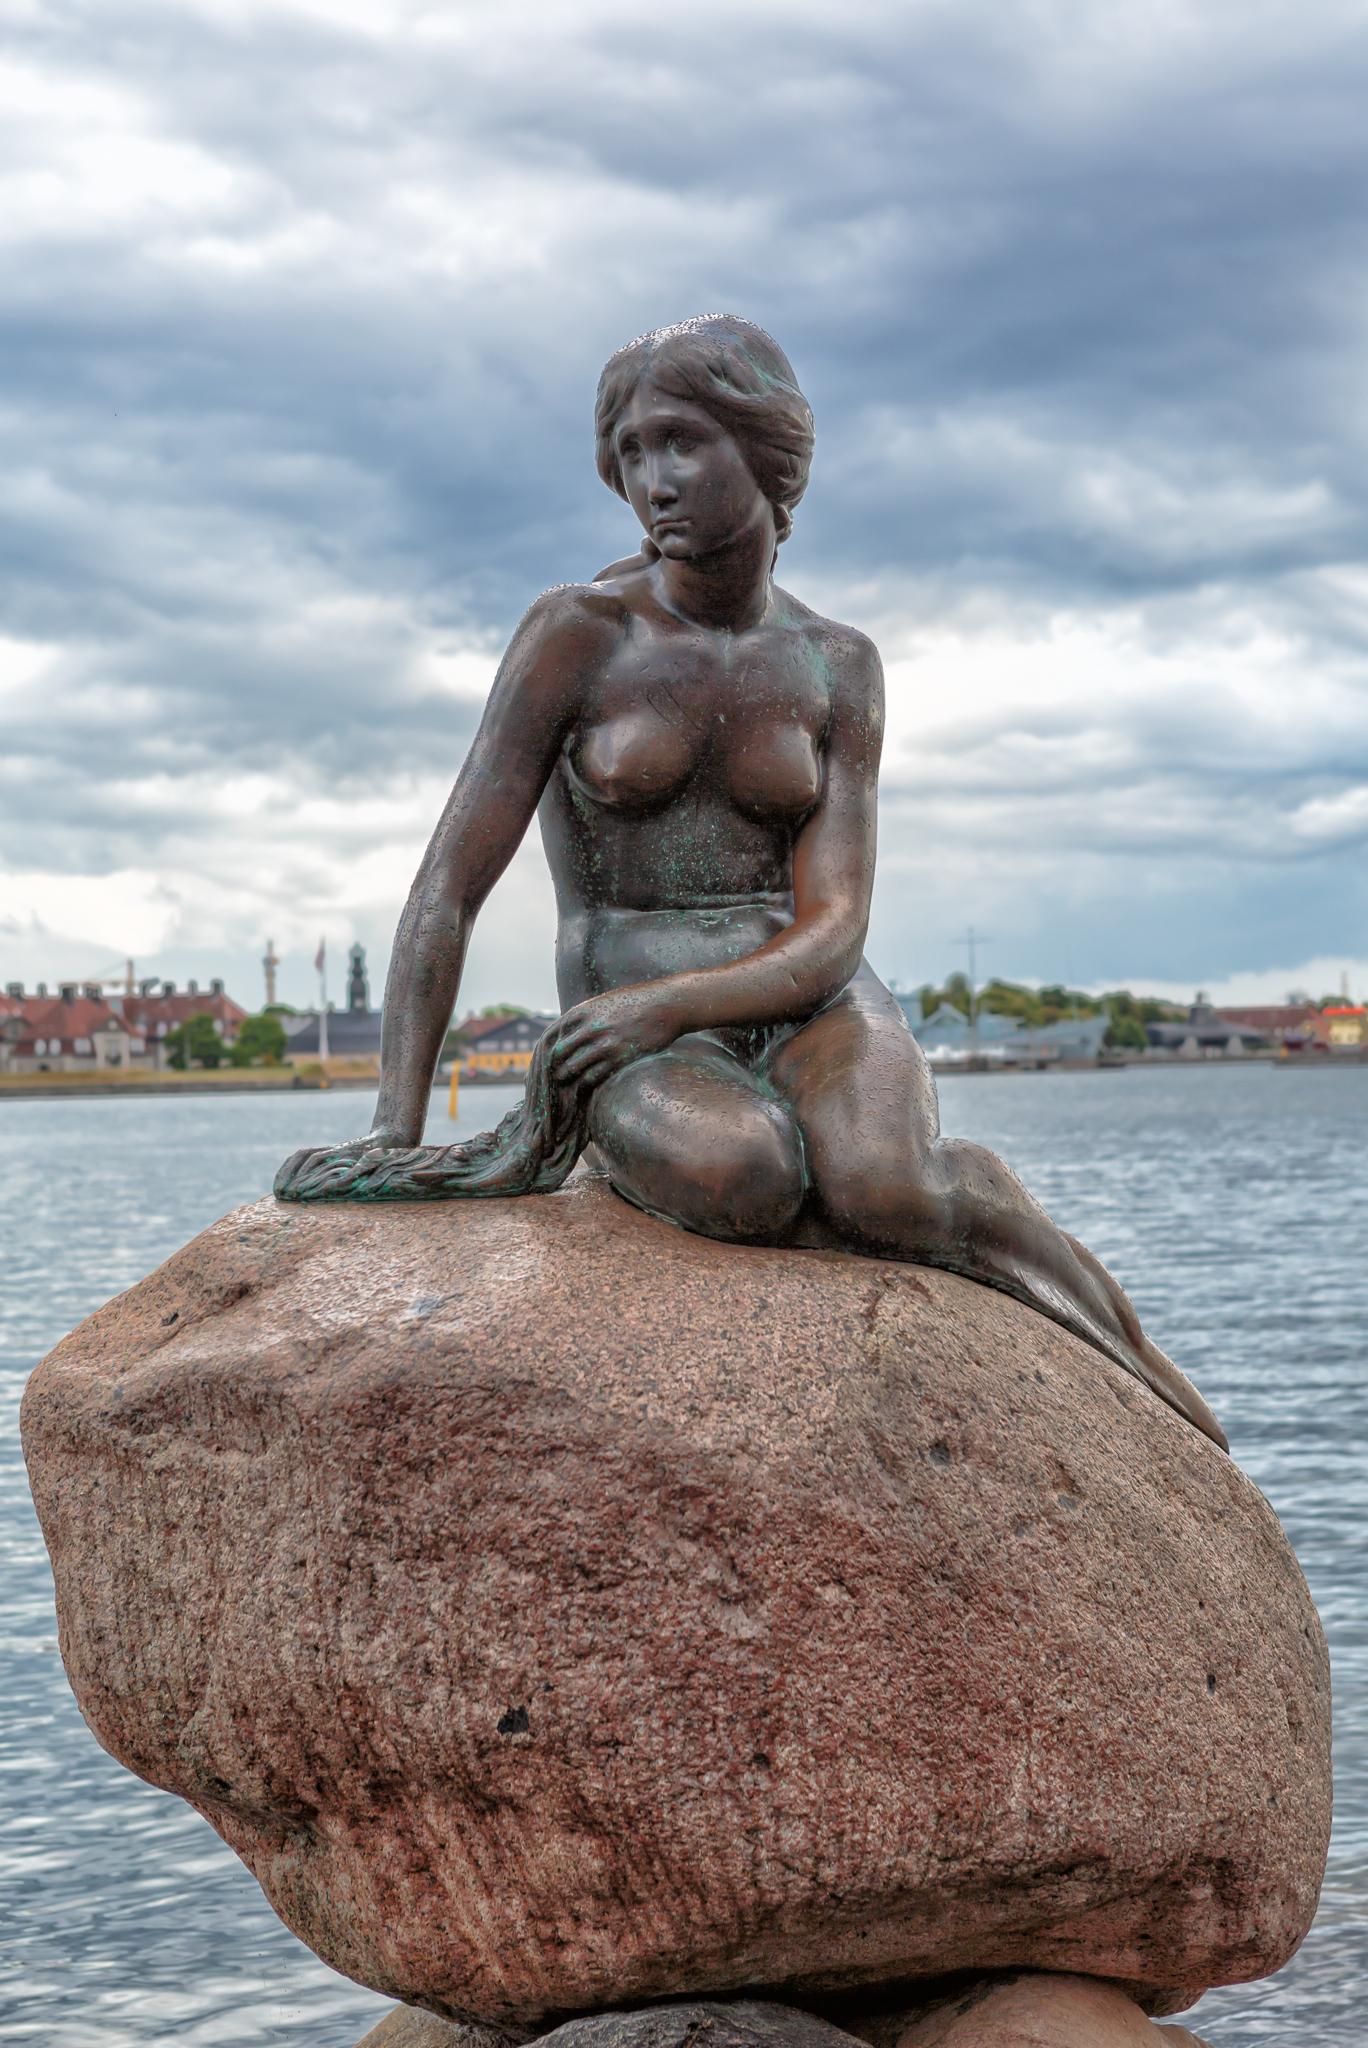 Copenhagen_-_the_little_mermaid_statue_-_2013.jpg